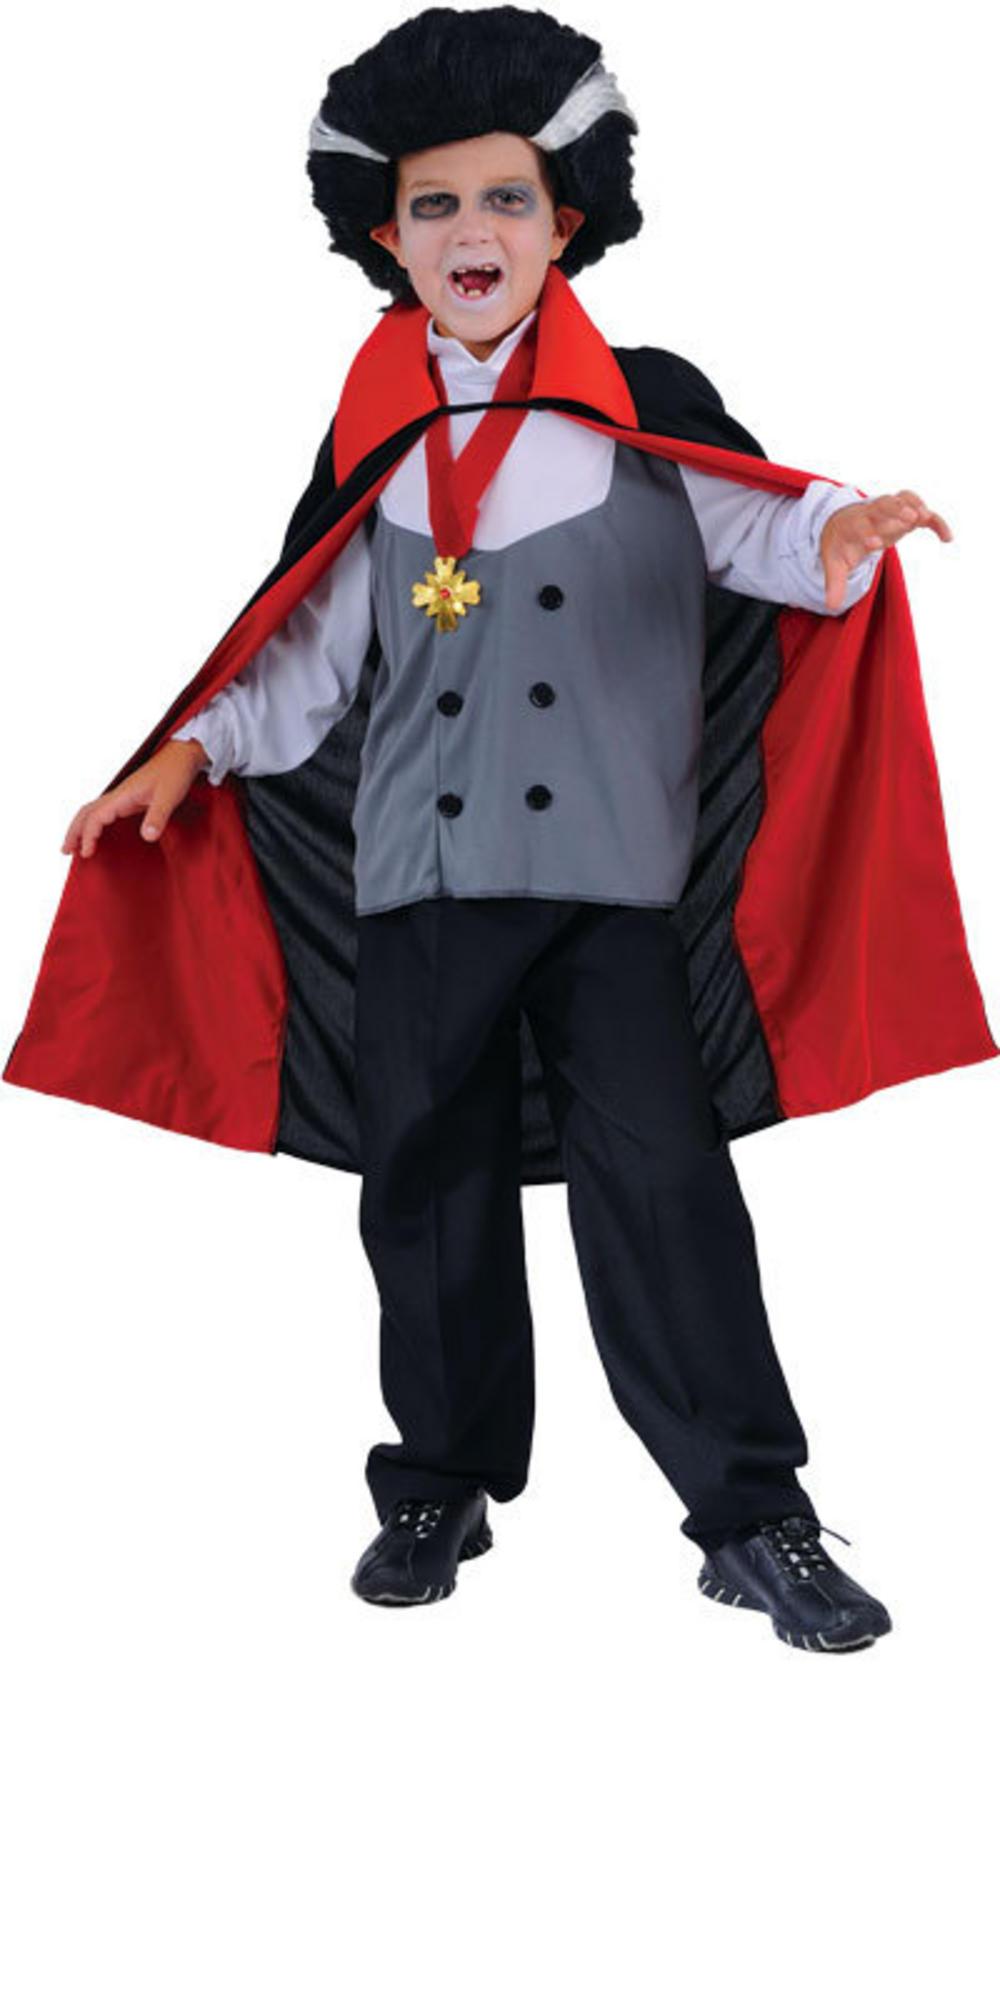 Kids Halloween Costumes On Sale